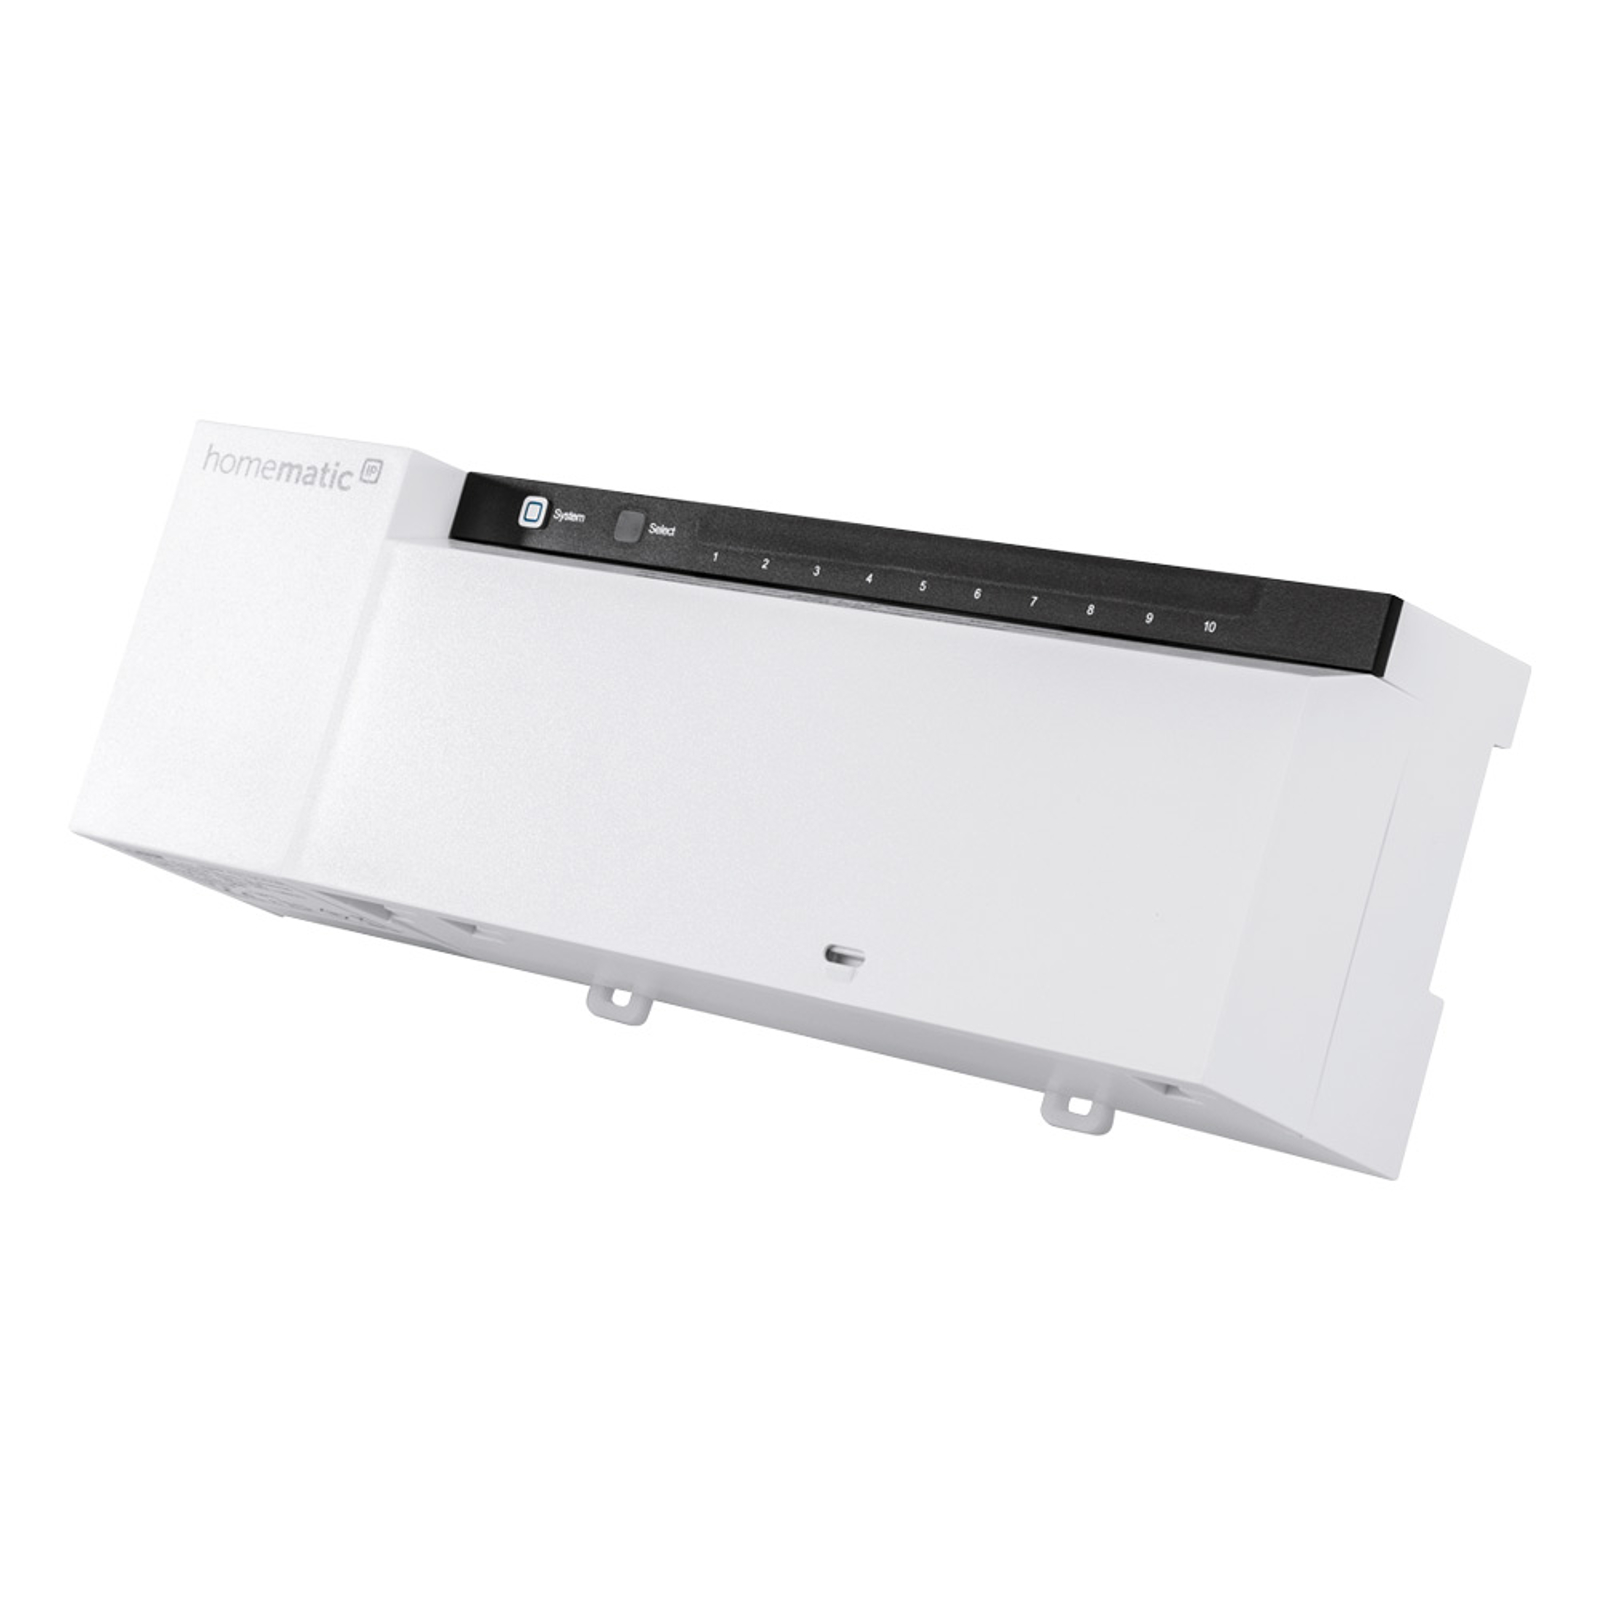 Homematic IP-gulvvarmeaktuator, 10x, 230V